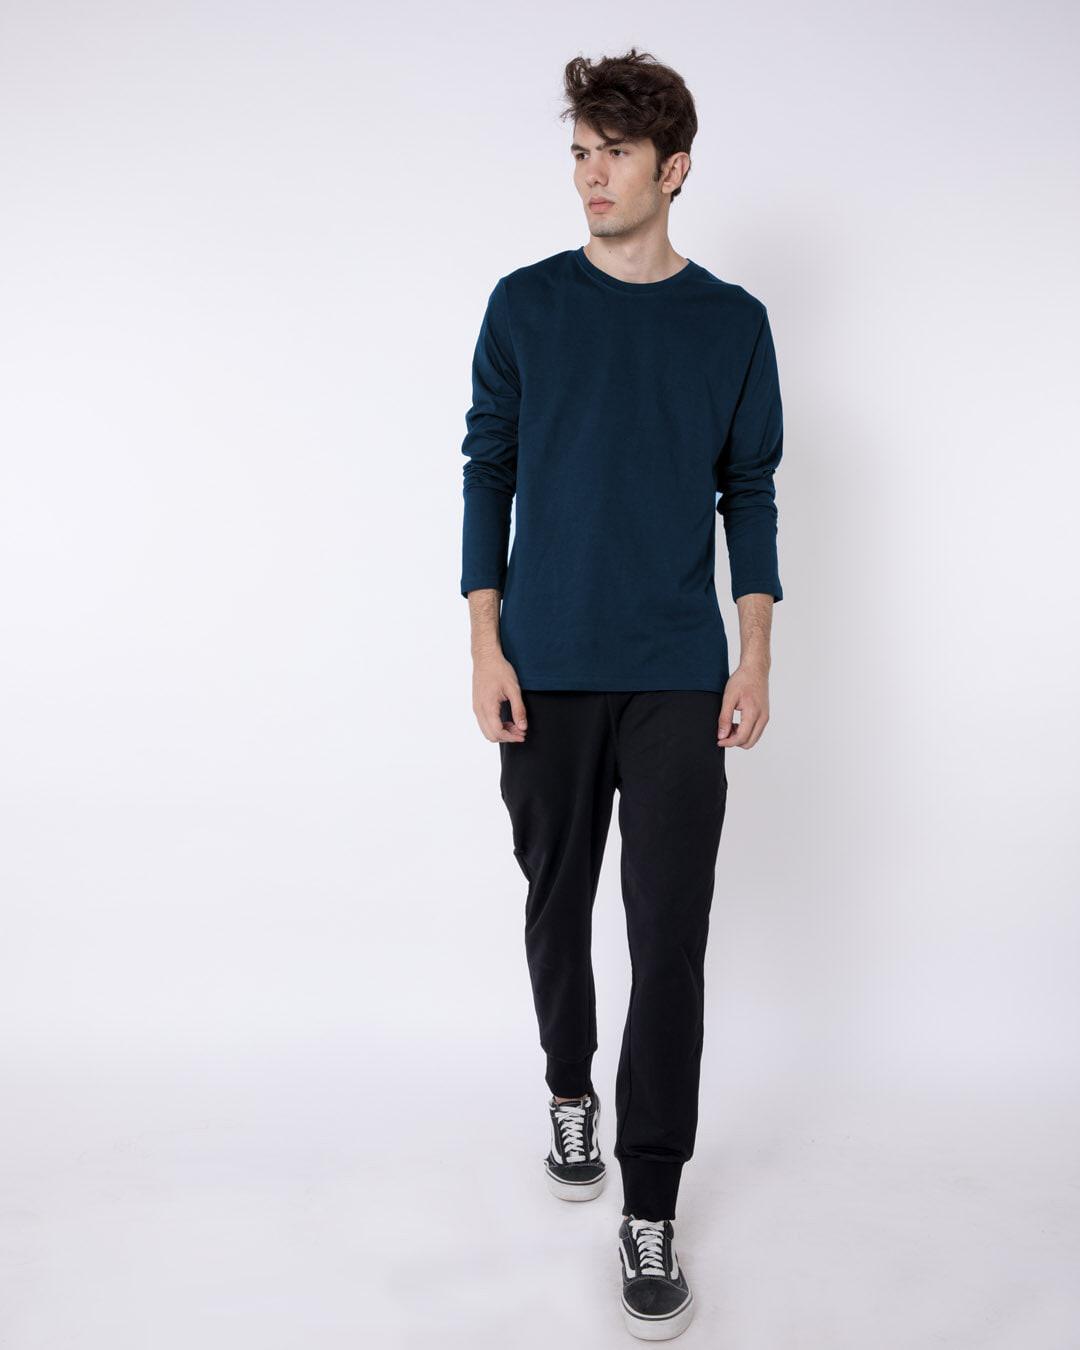 ff7efa6b7c3 Tag Navy Blue T Shirt Full Sleeve — waldon.protese-de-silicone.info